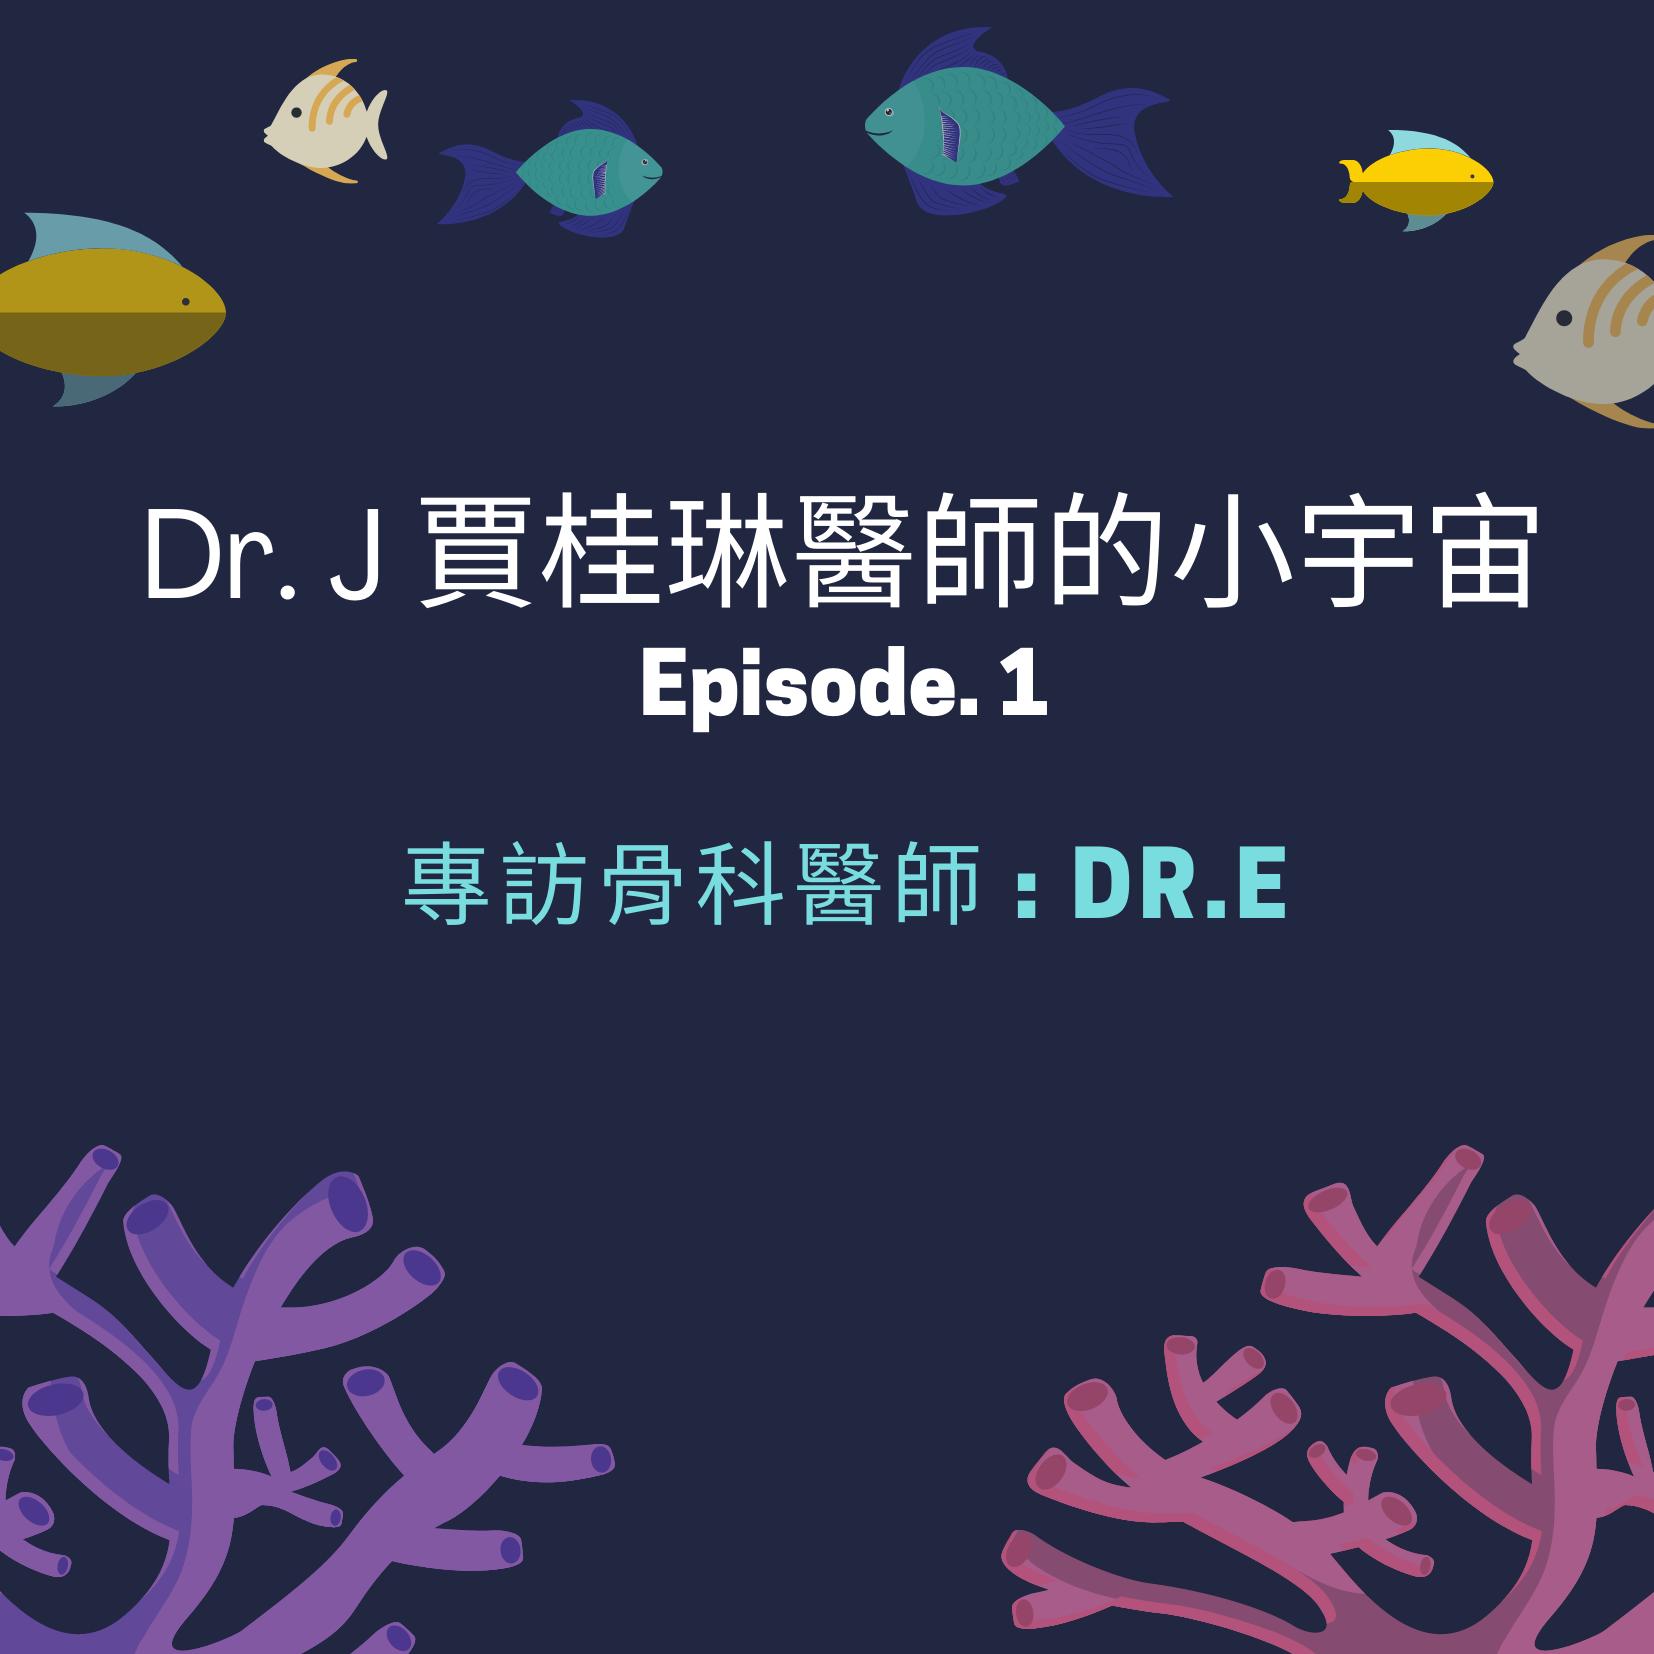 【Episode 1 : 我的Podcast 首播 : 專訪骨科醫師 Dr. E】